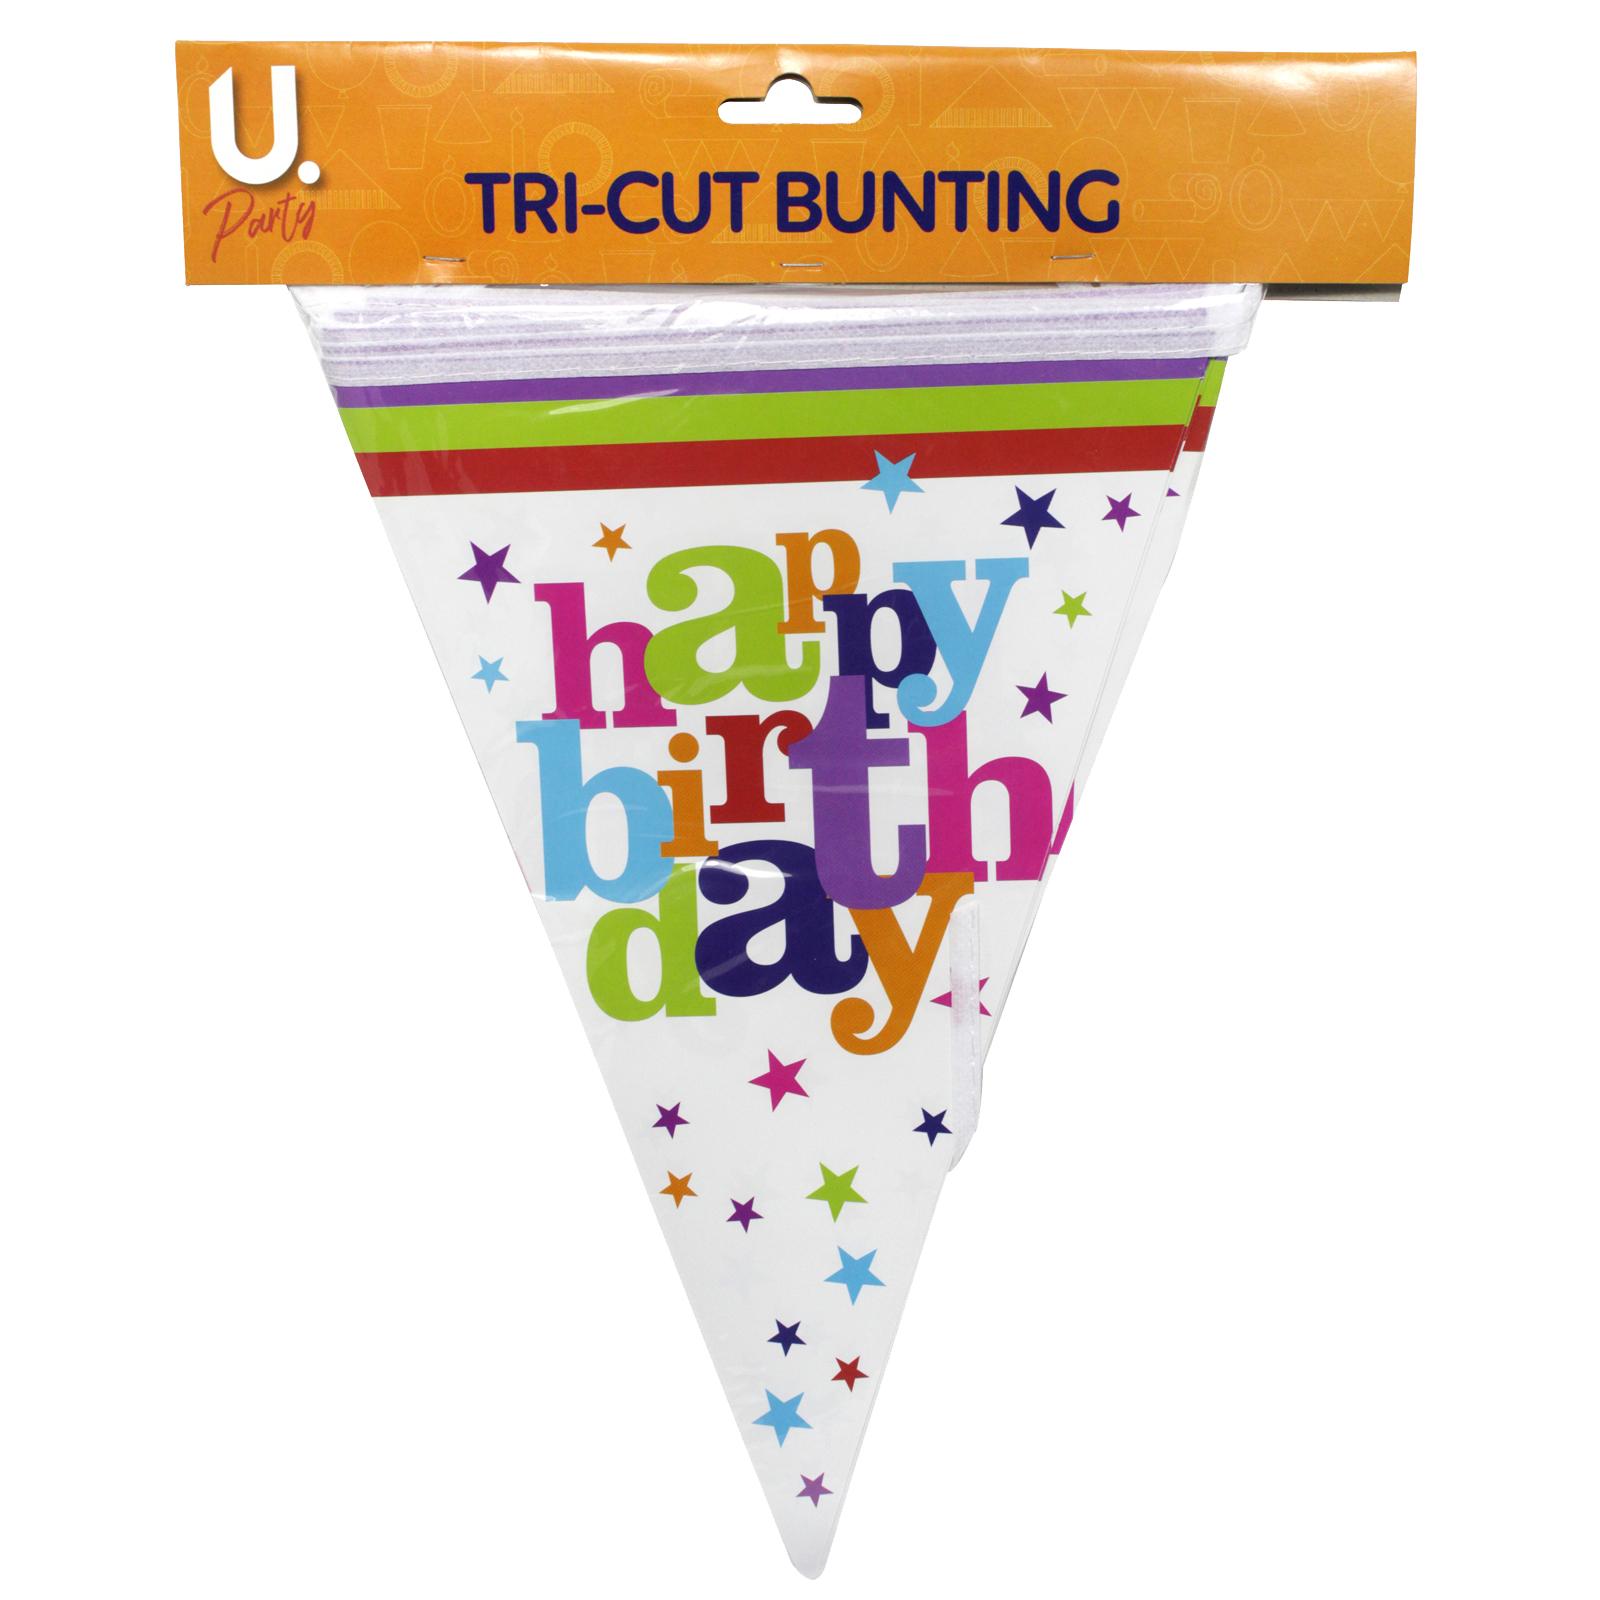 HAPPY BIRTHDAY PARTY BUNTING